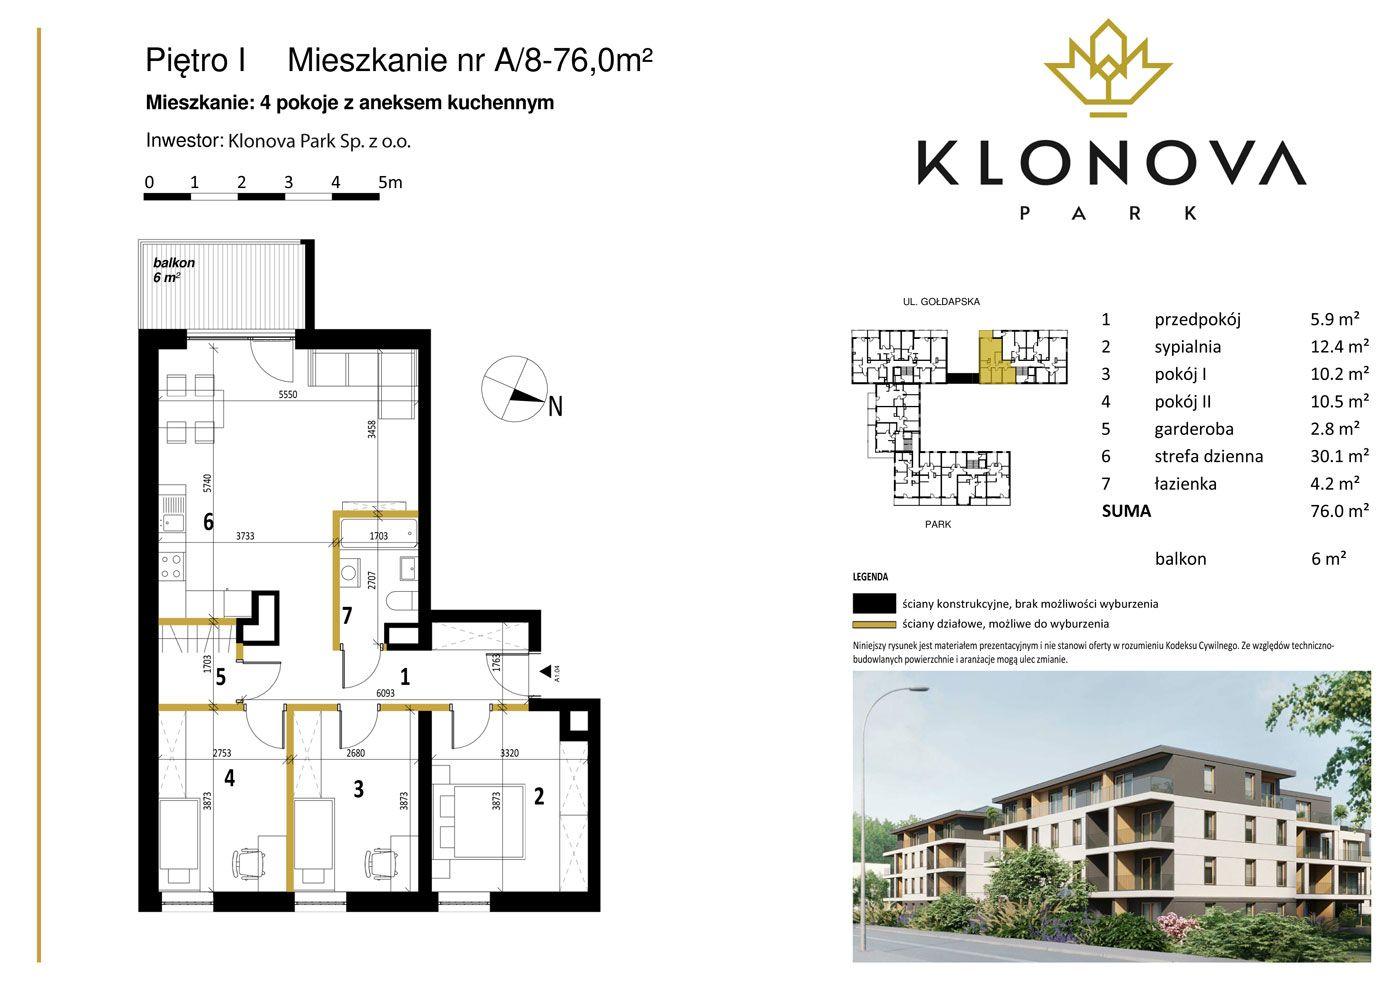 Apartamenty Klonova Park - Plan mieszkania A/8